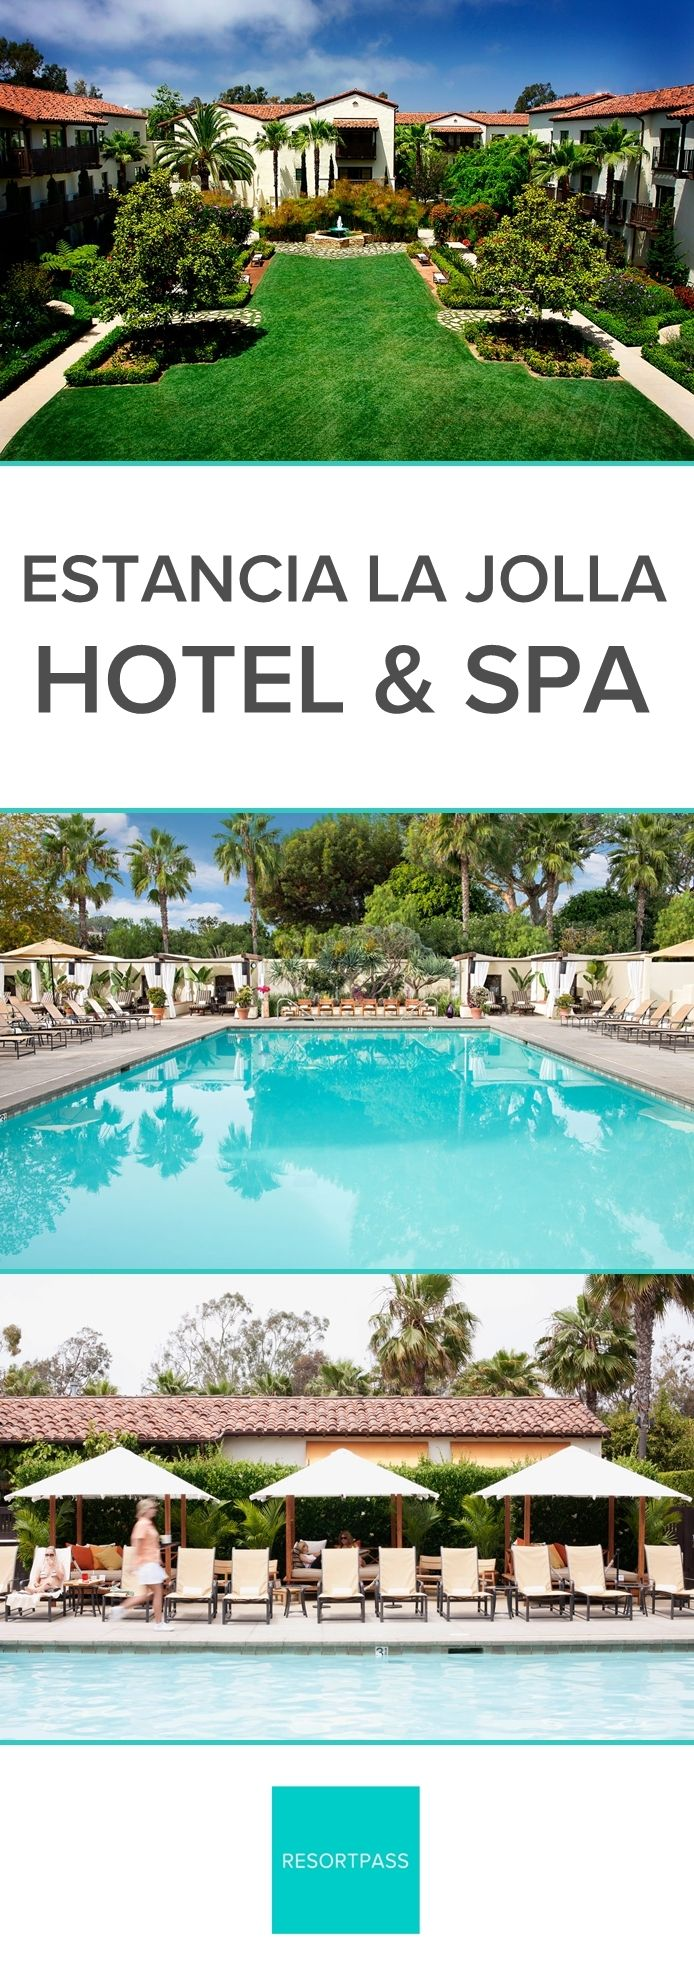 Estancia La Jolla Is A Boutique Luxury Resort Located Near